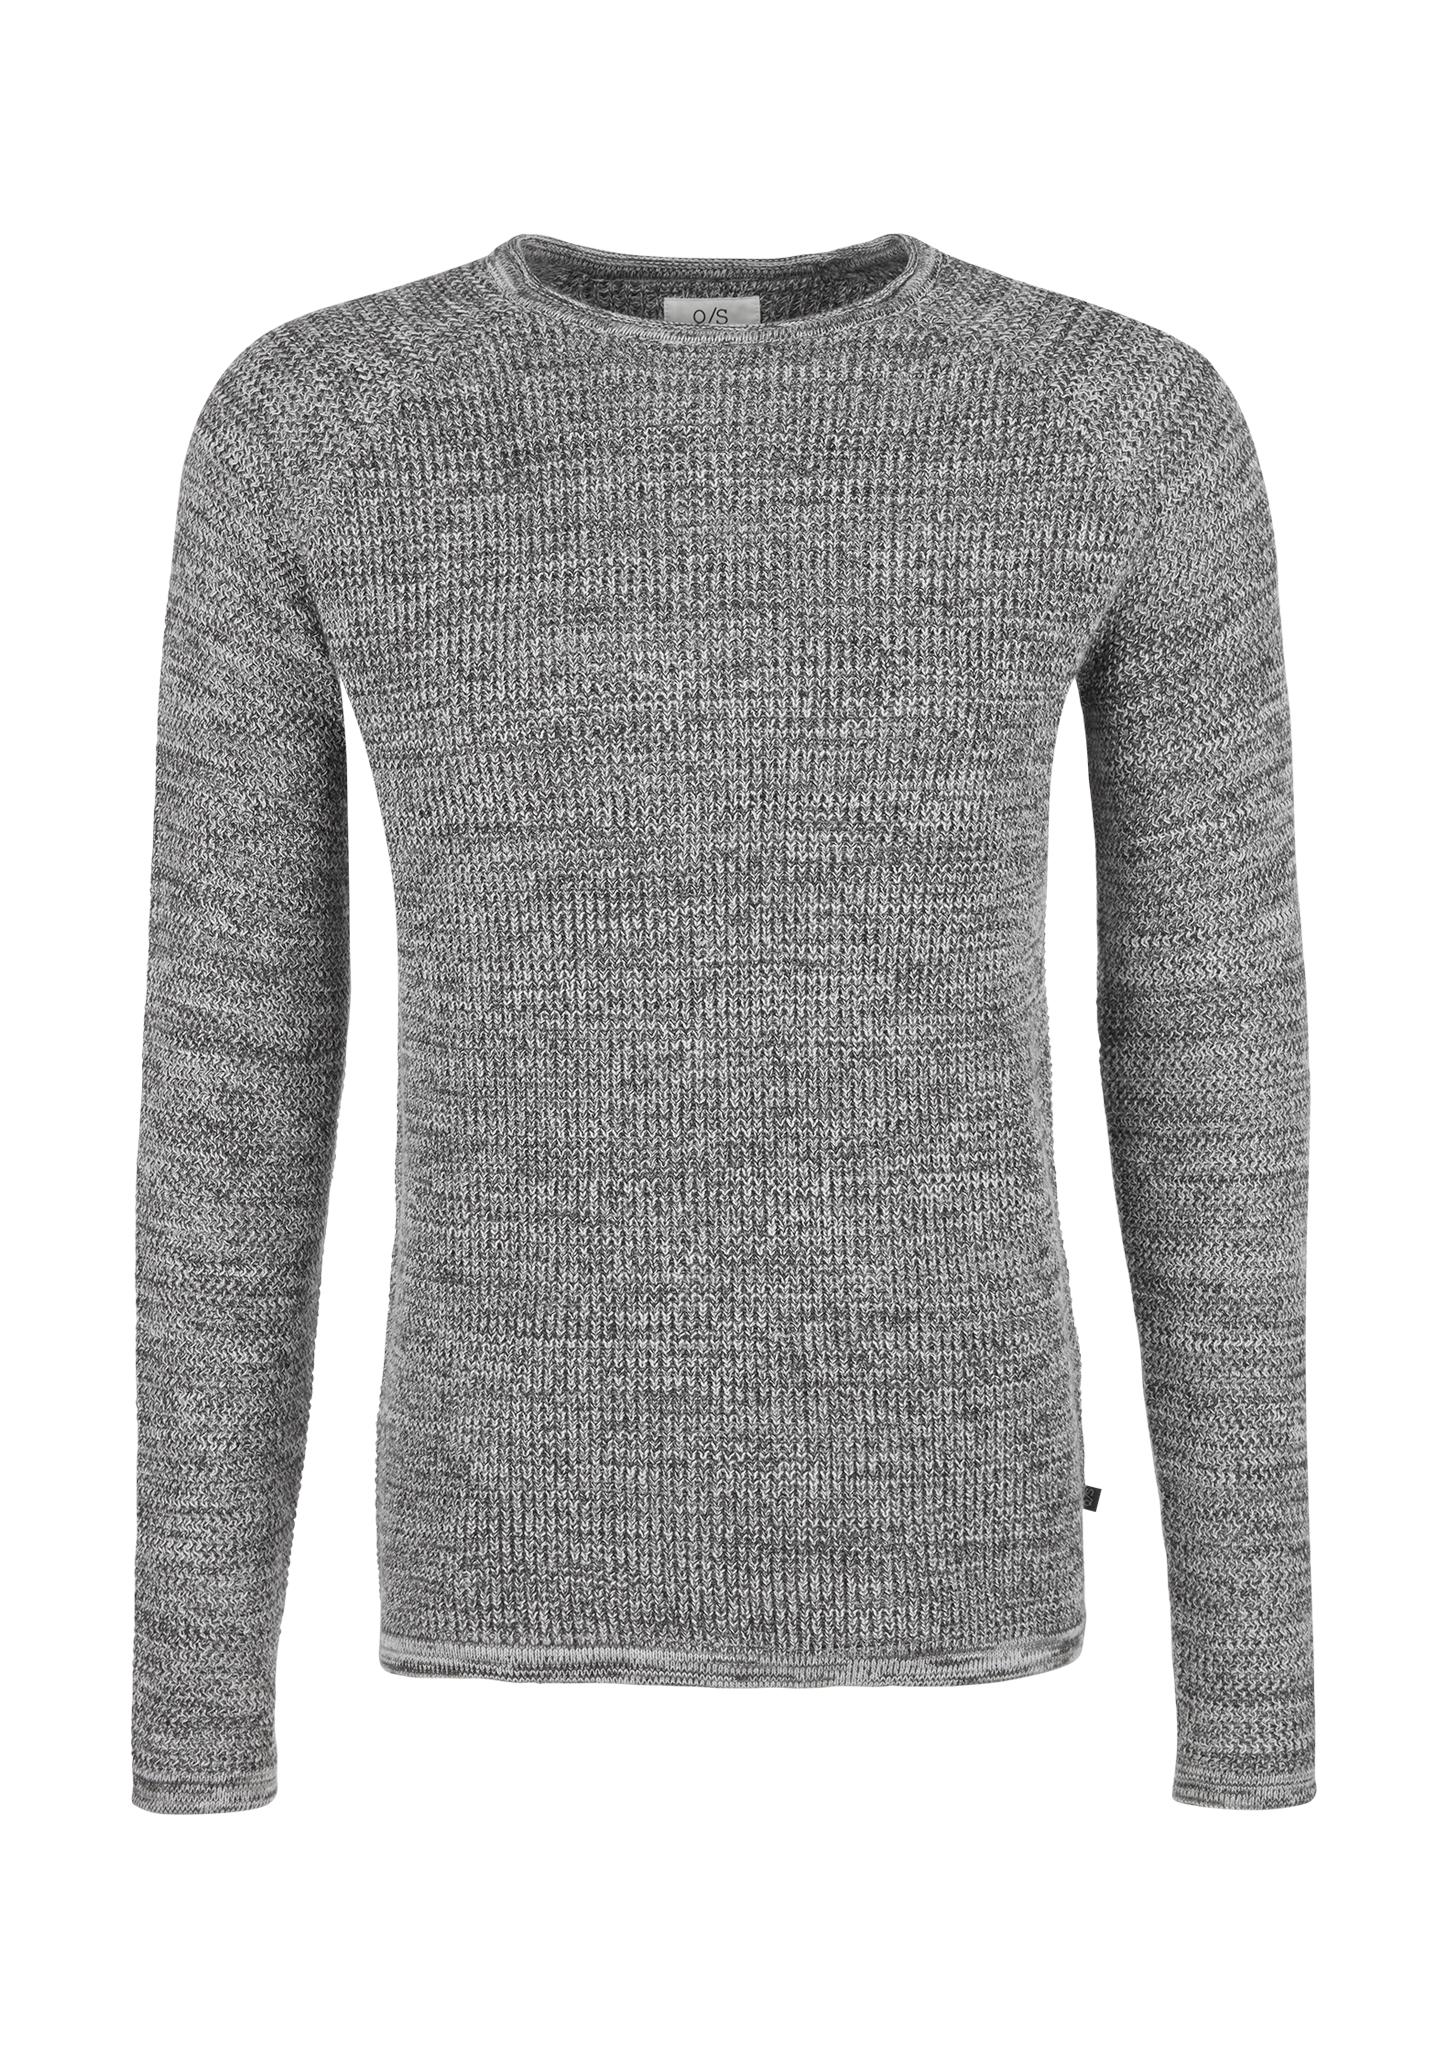 Pullover | Bekleidung > Pullover > Sonstige Pullover | Grau | 100% baumwolle | Q/S designed by